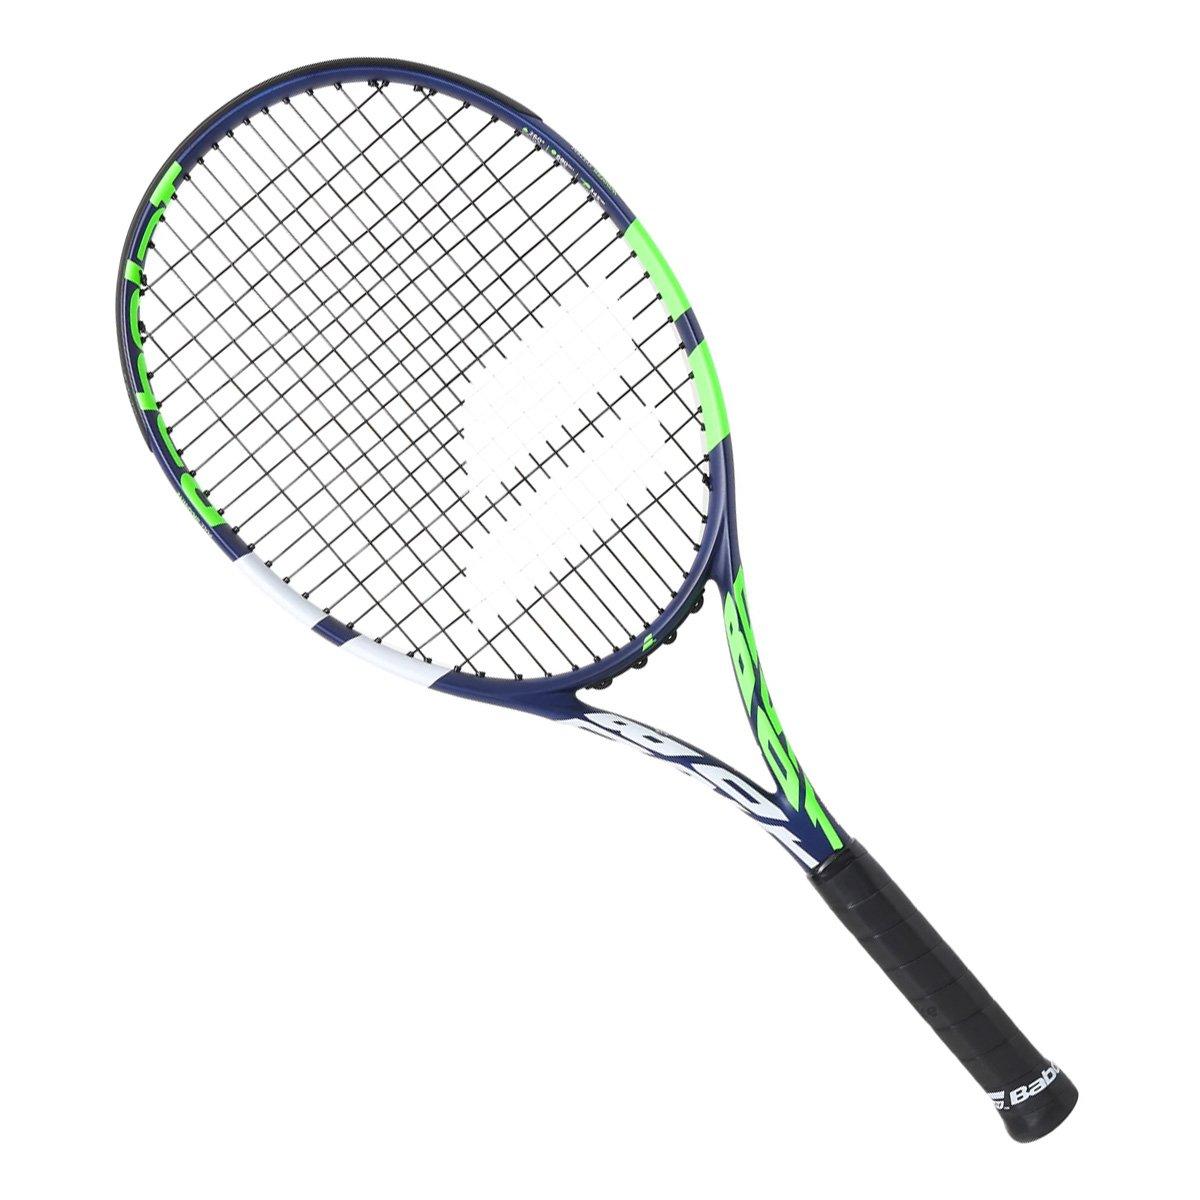 Raquete de Tênis Babolat Boost Drive 105 Azul Verde e Branco L2